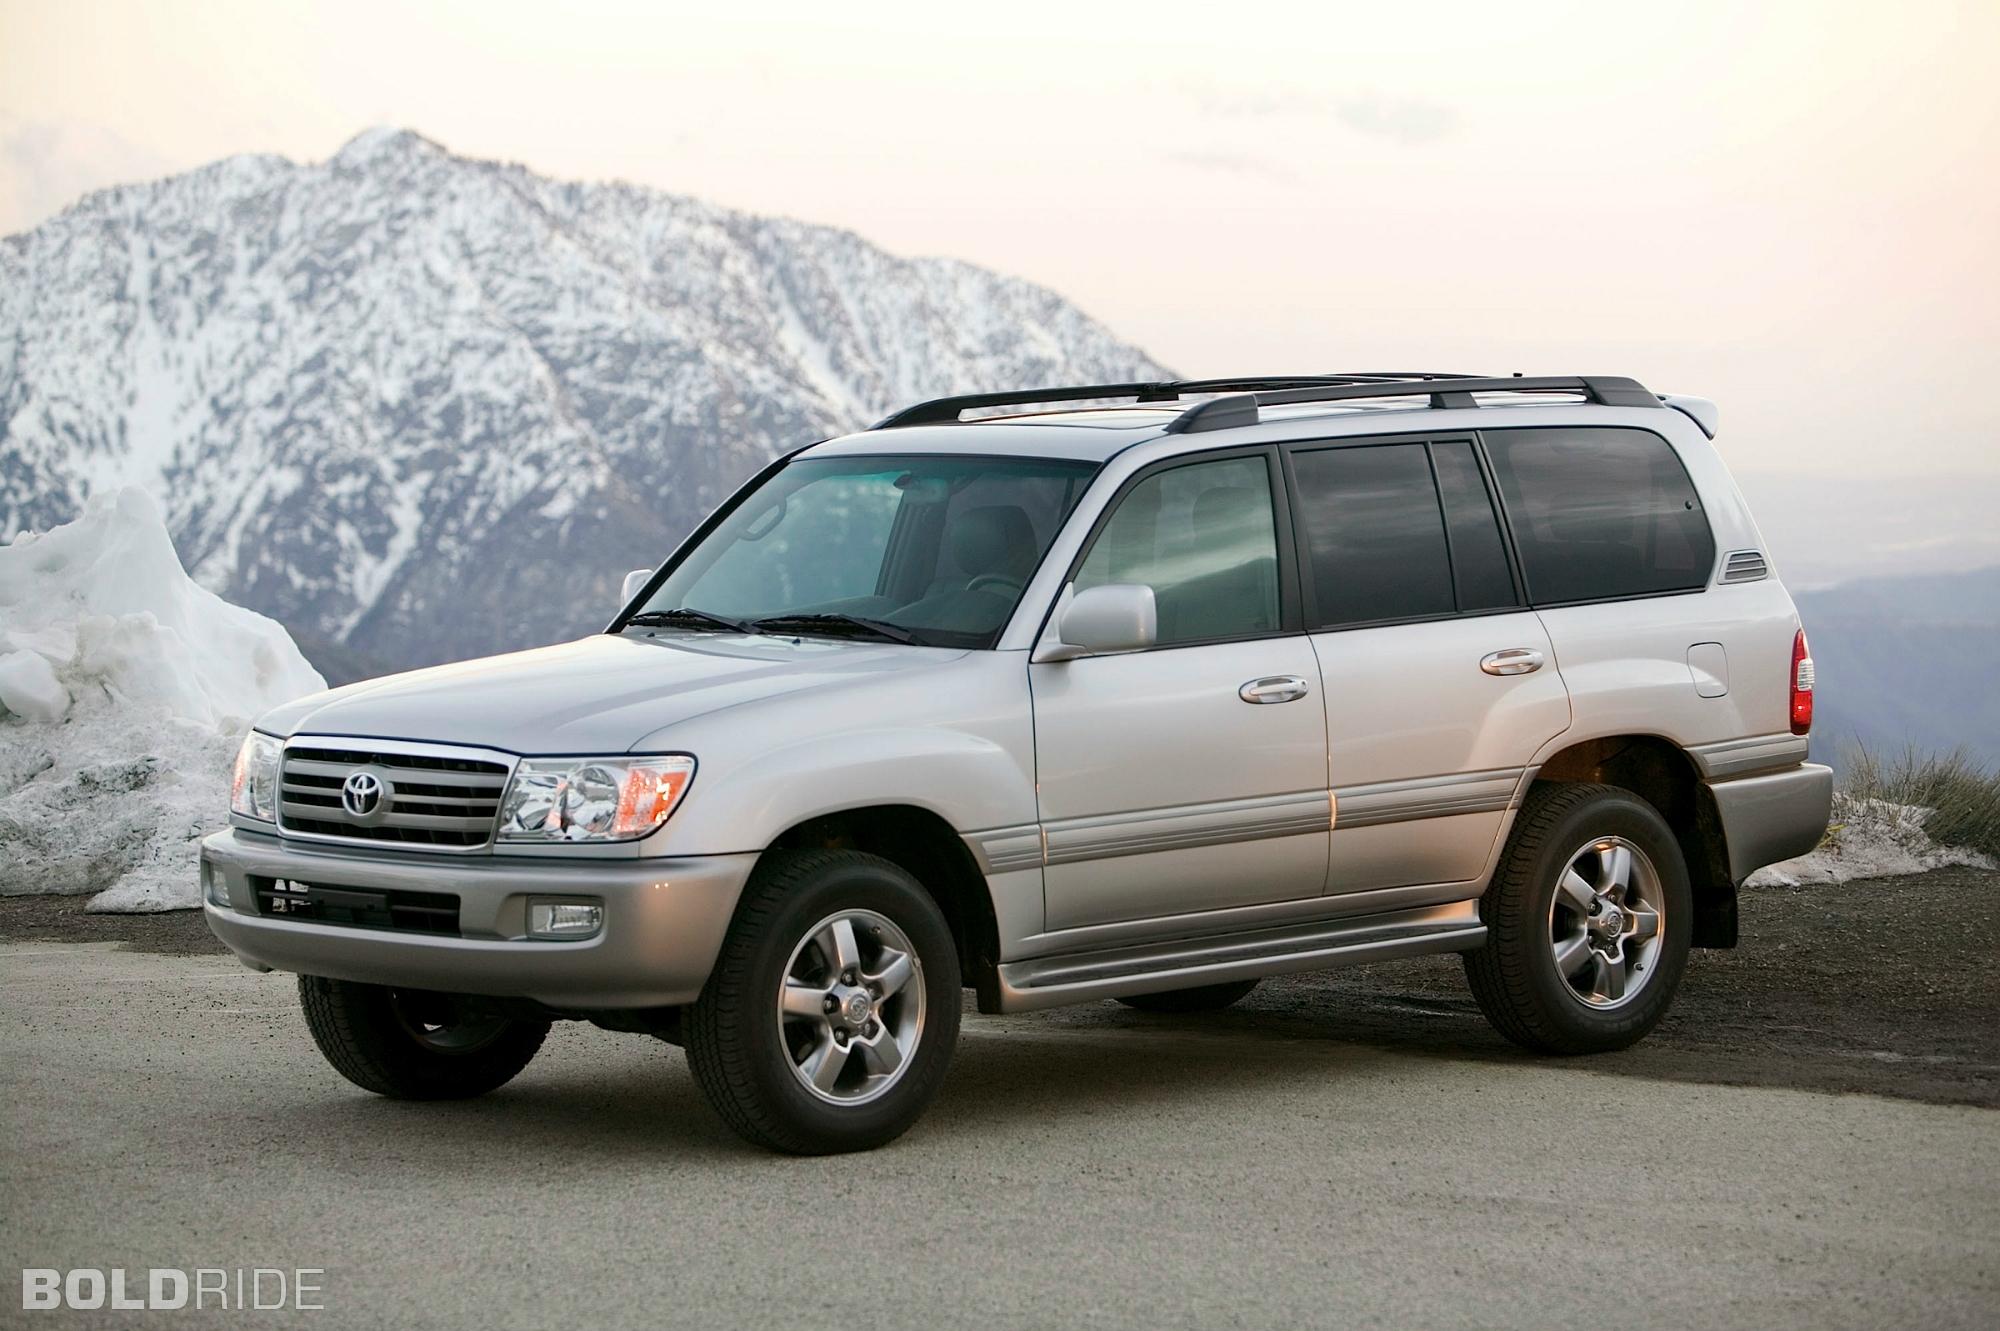 2000 Toyota Land Cruiser Image 6